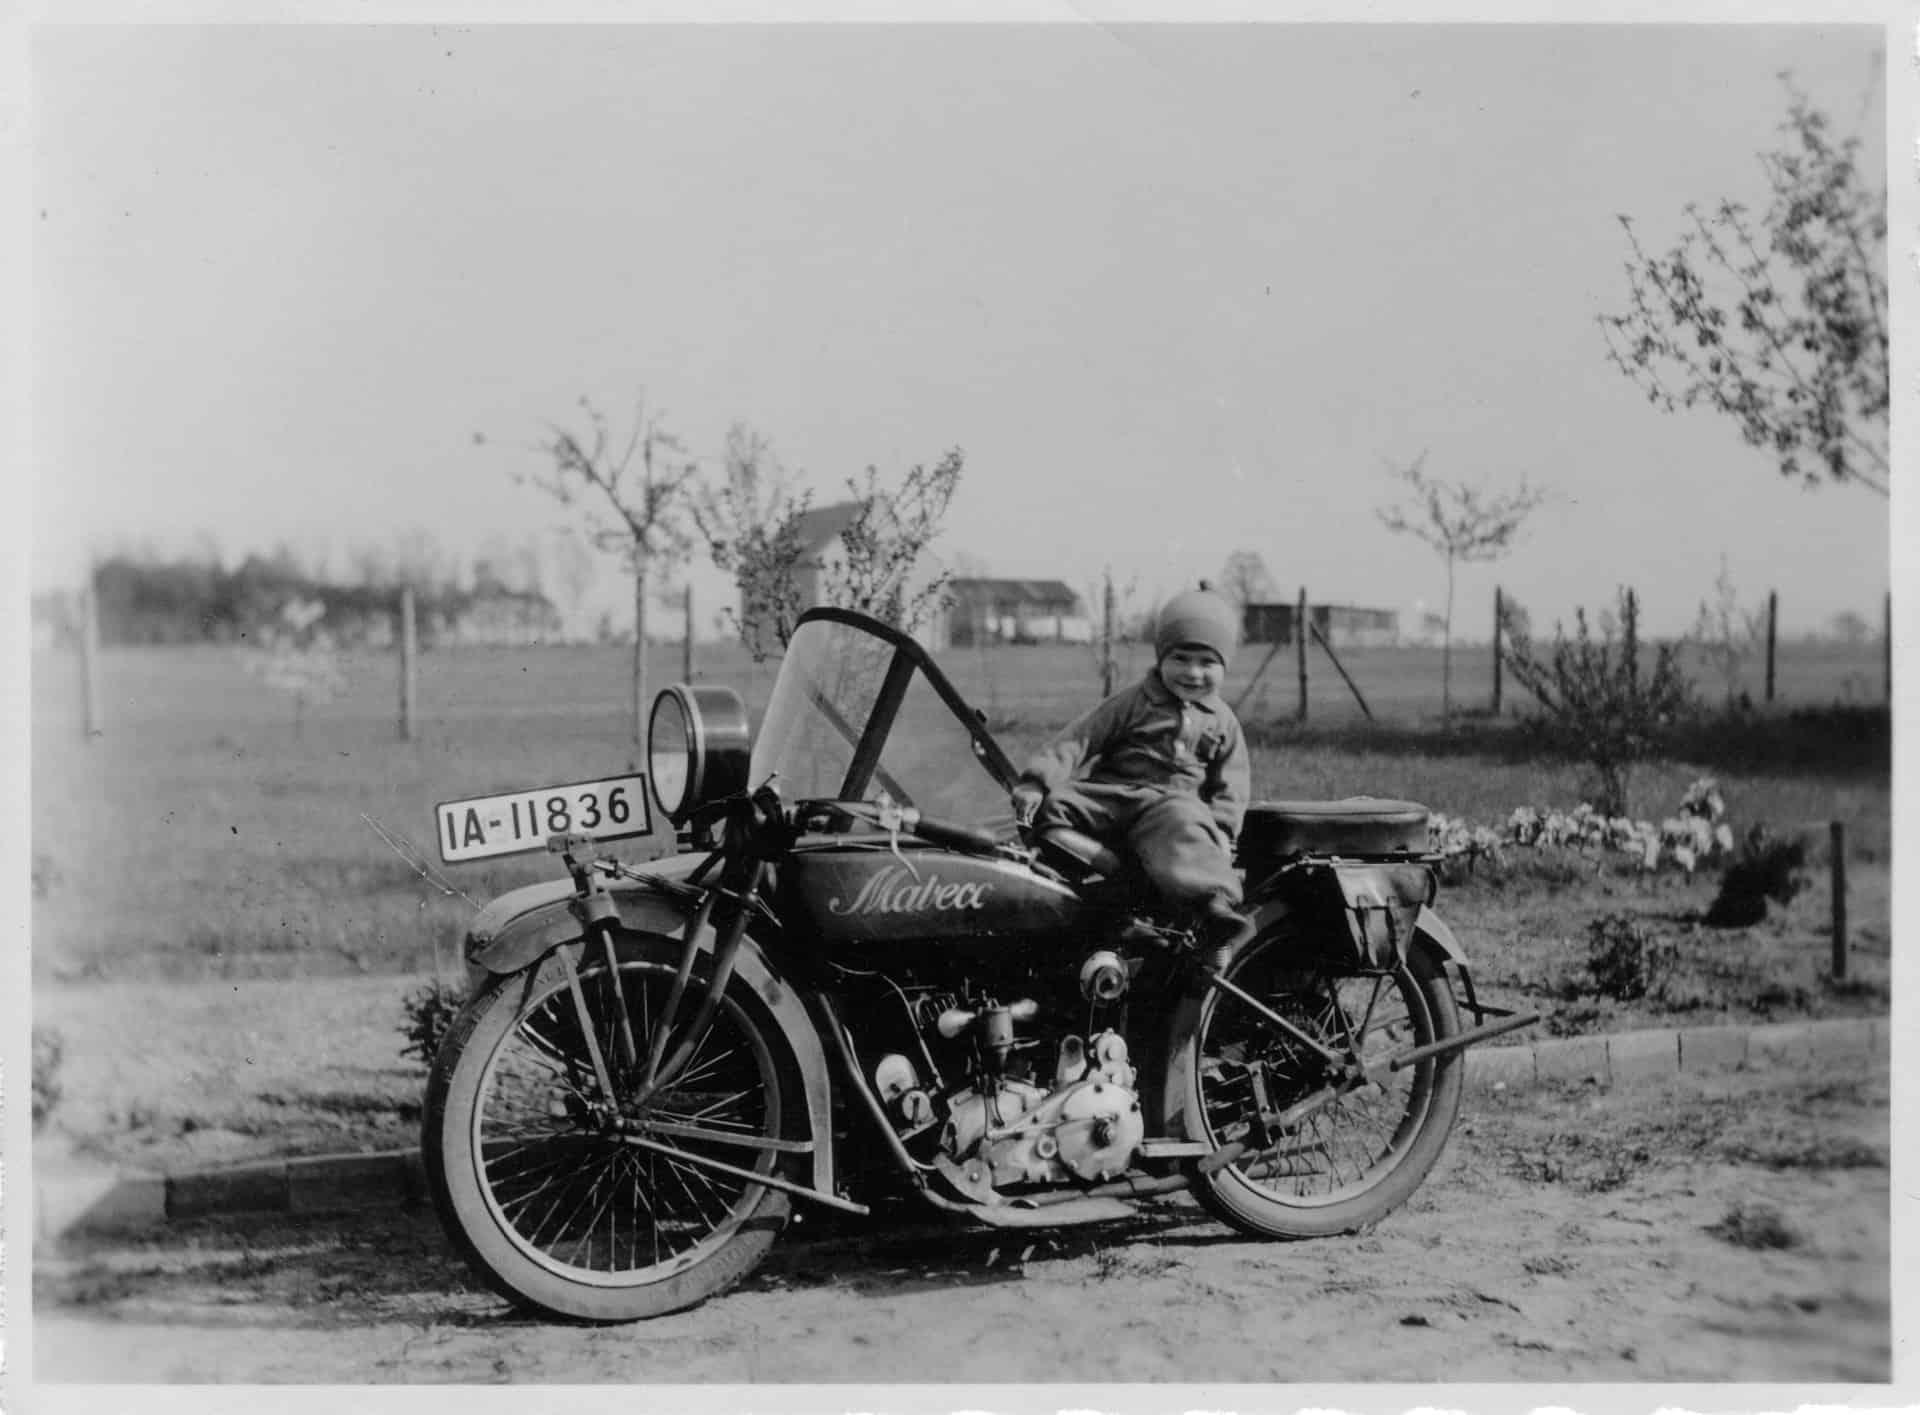 vintage photo motorcycle